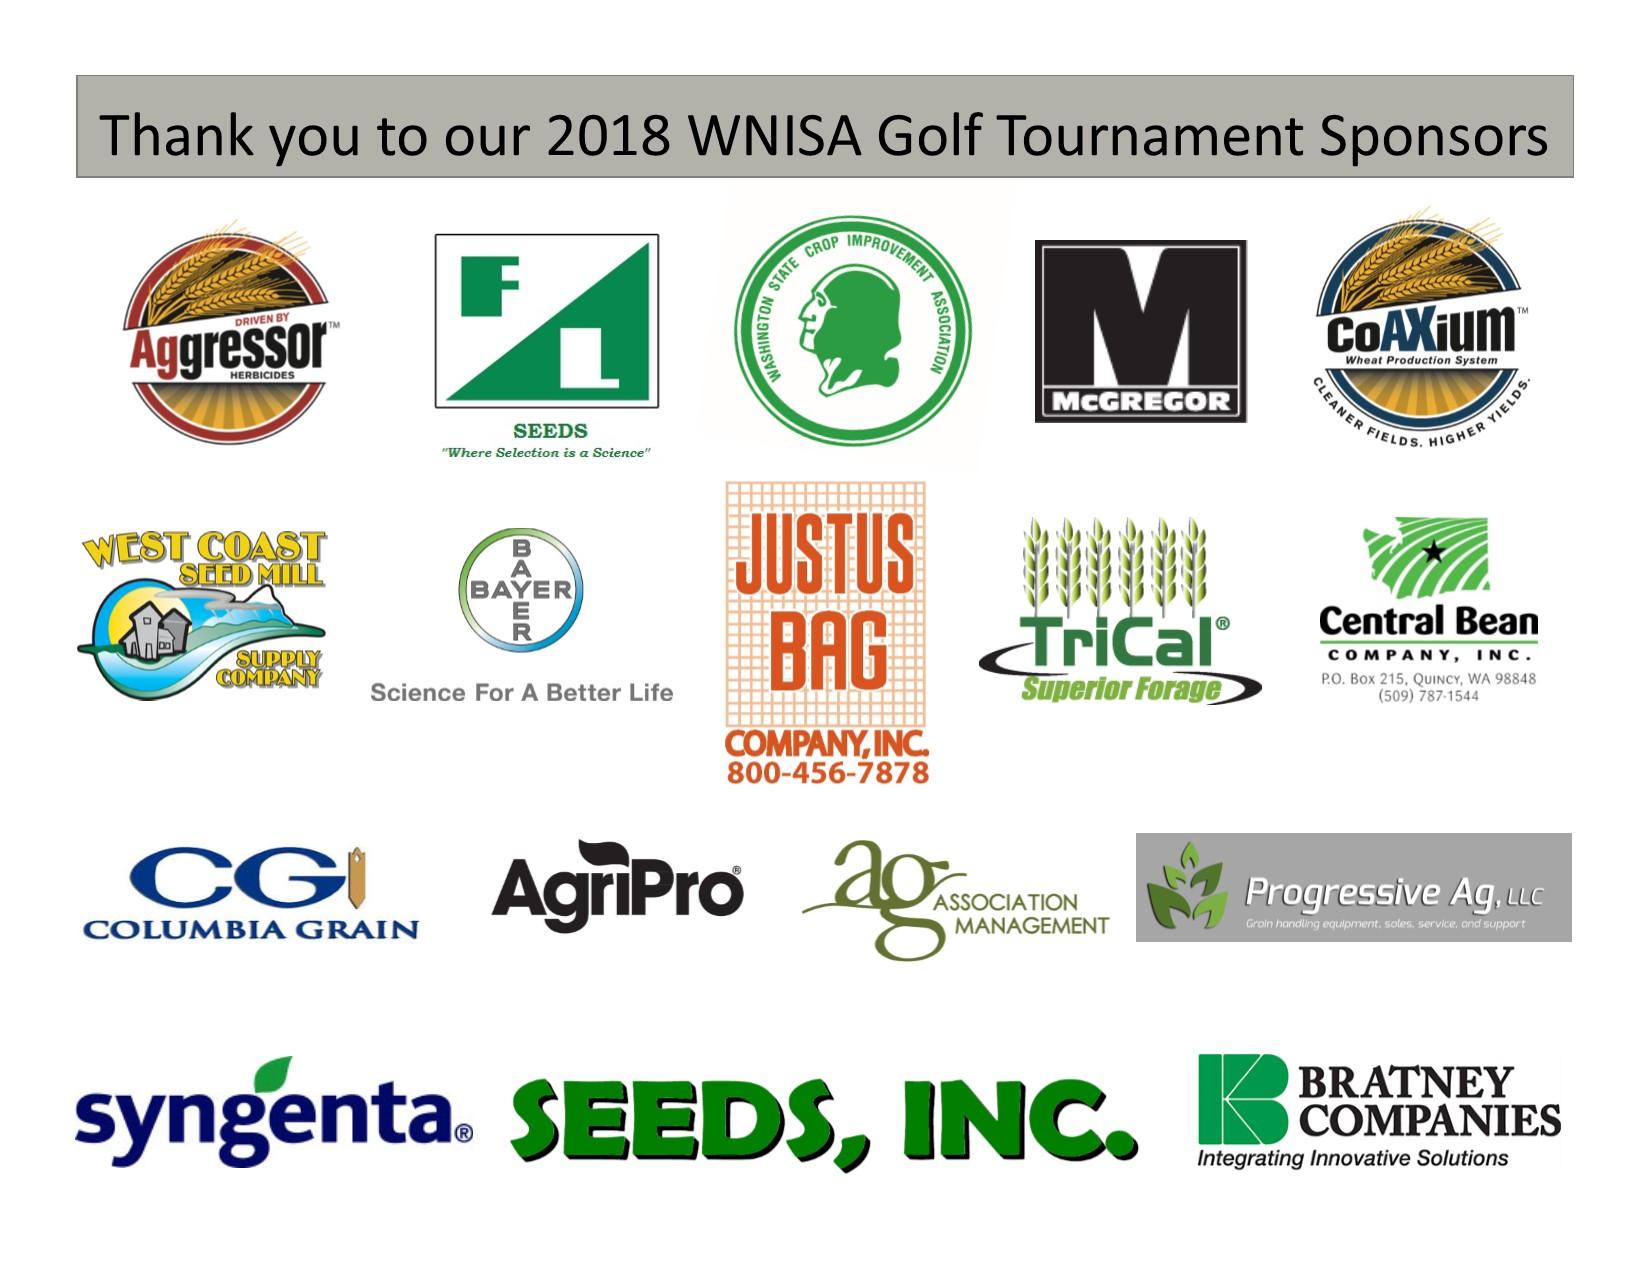 Thank you 2018 WNISA Golf Sponsors FINAL.jpg